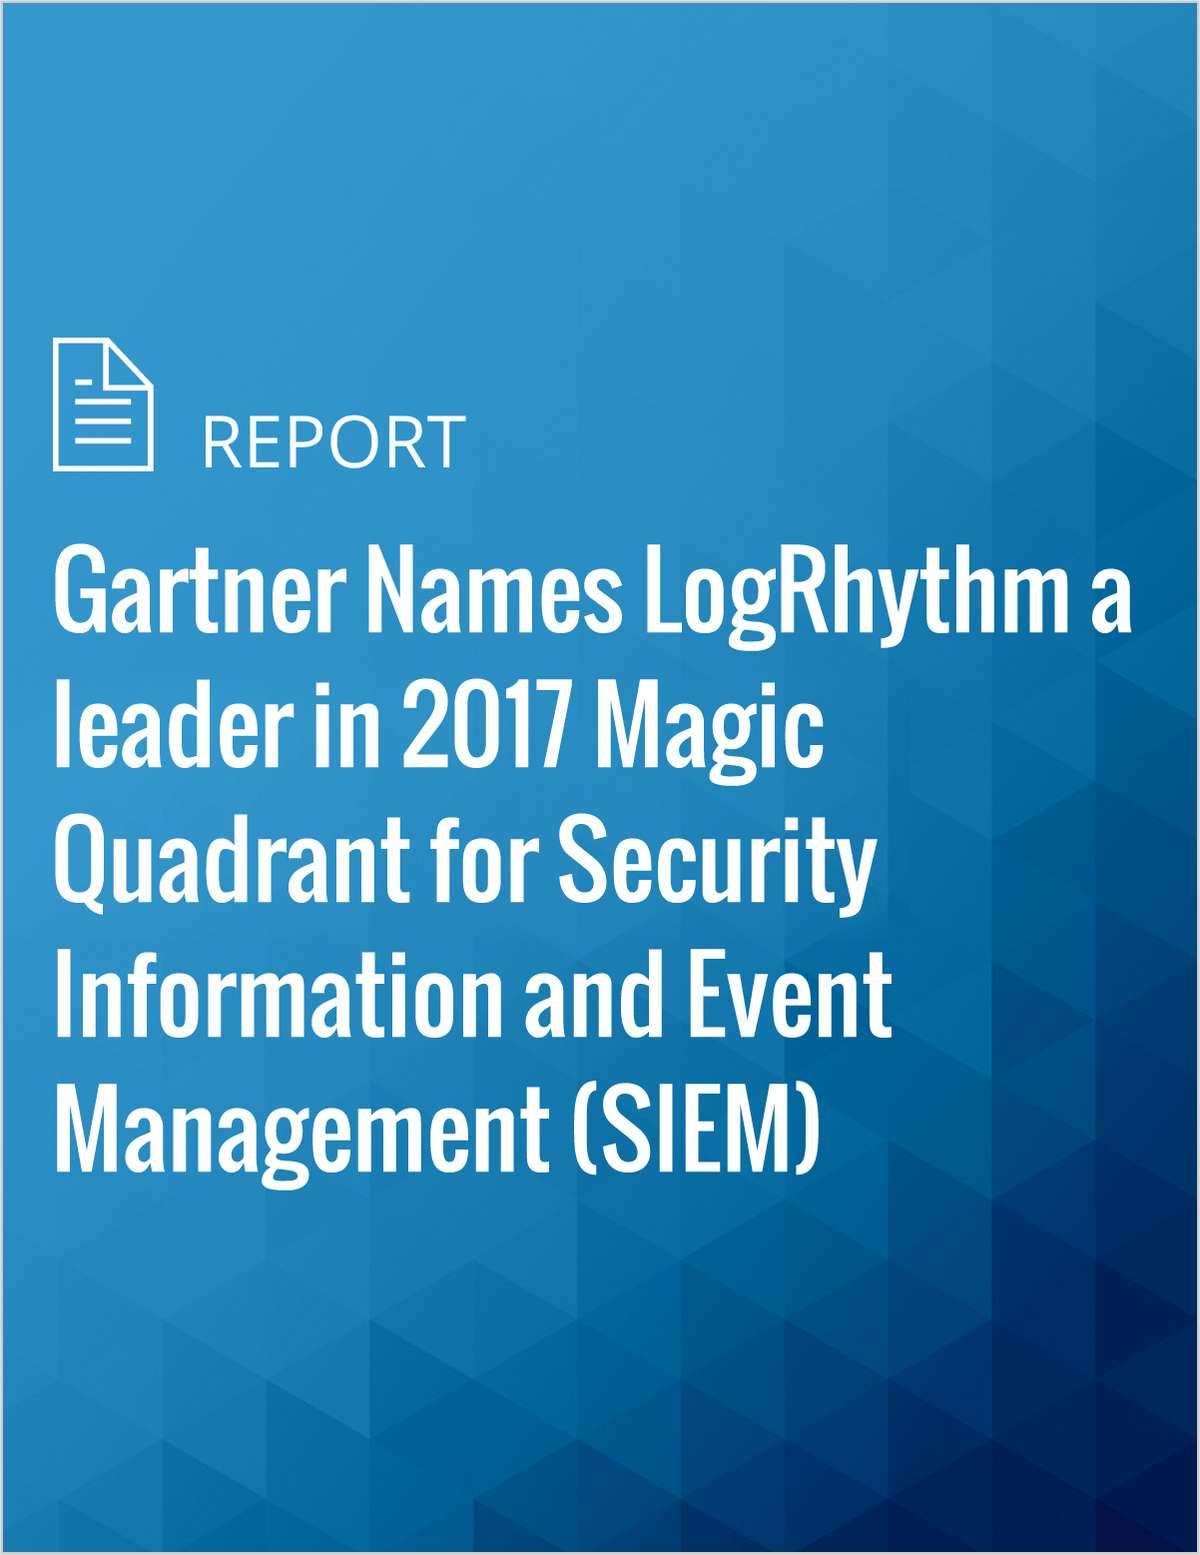 Gartner Names LogRhythm a leader in 2017 Magic Quadrant for Security Information and Event Management (SIEM)